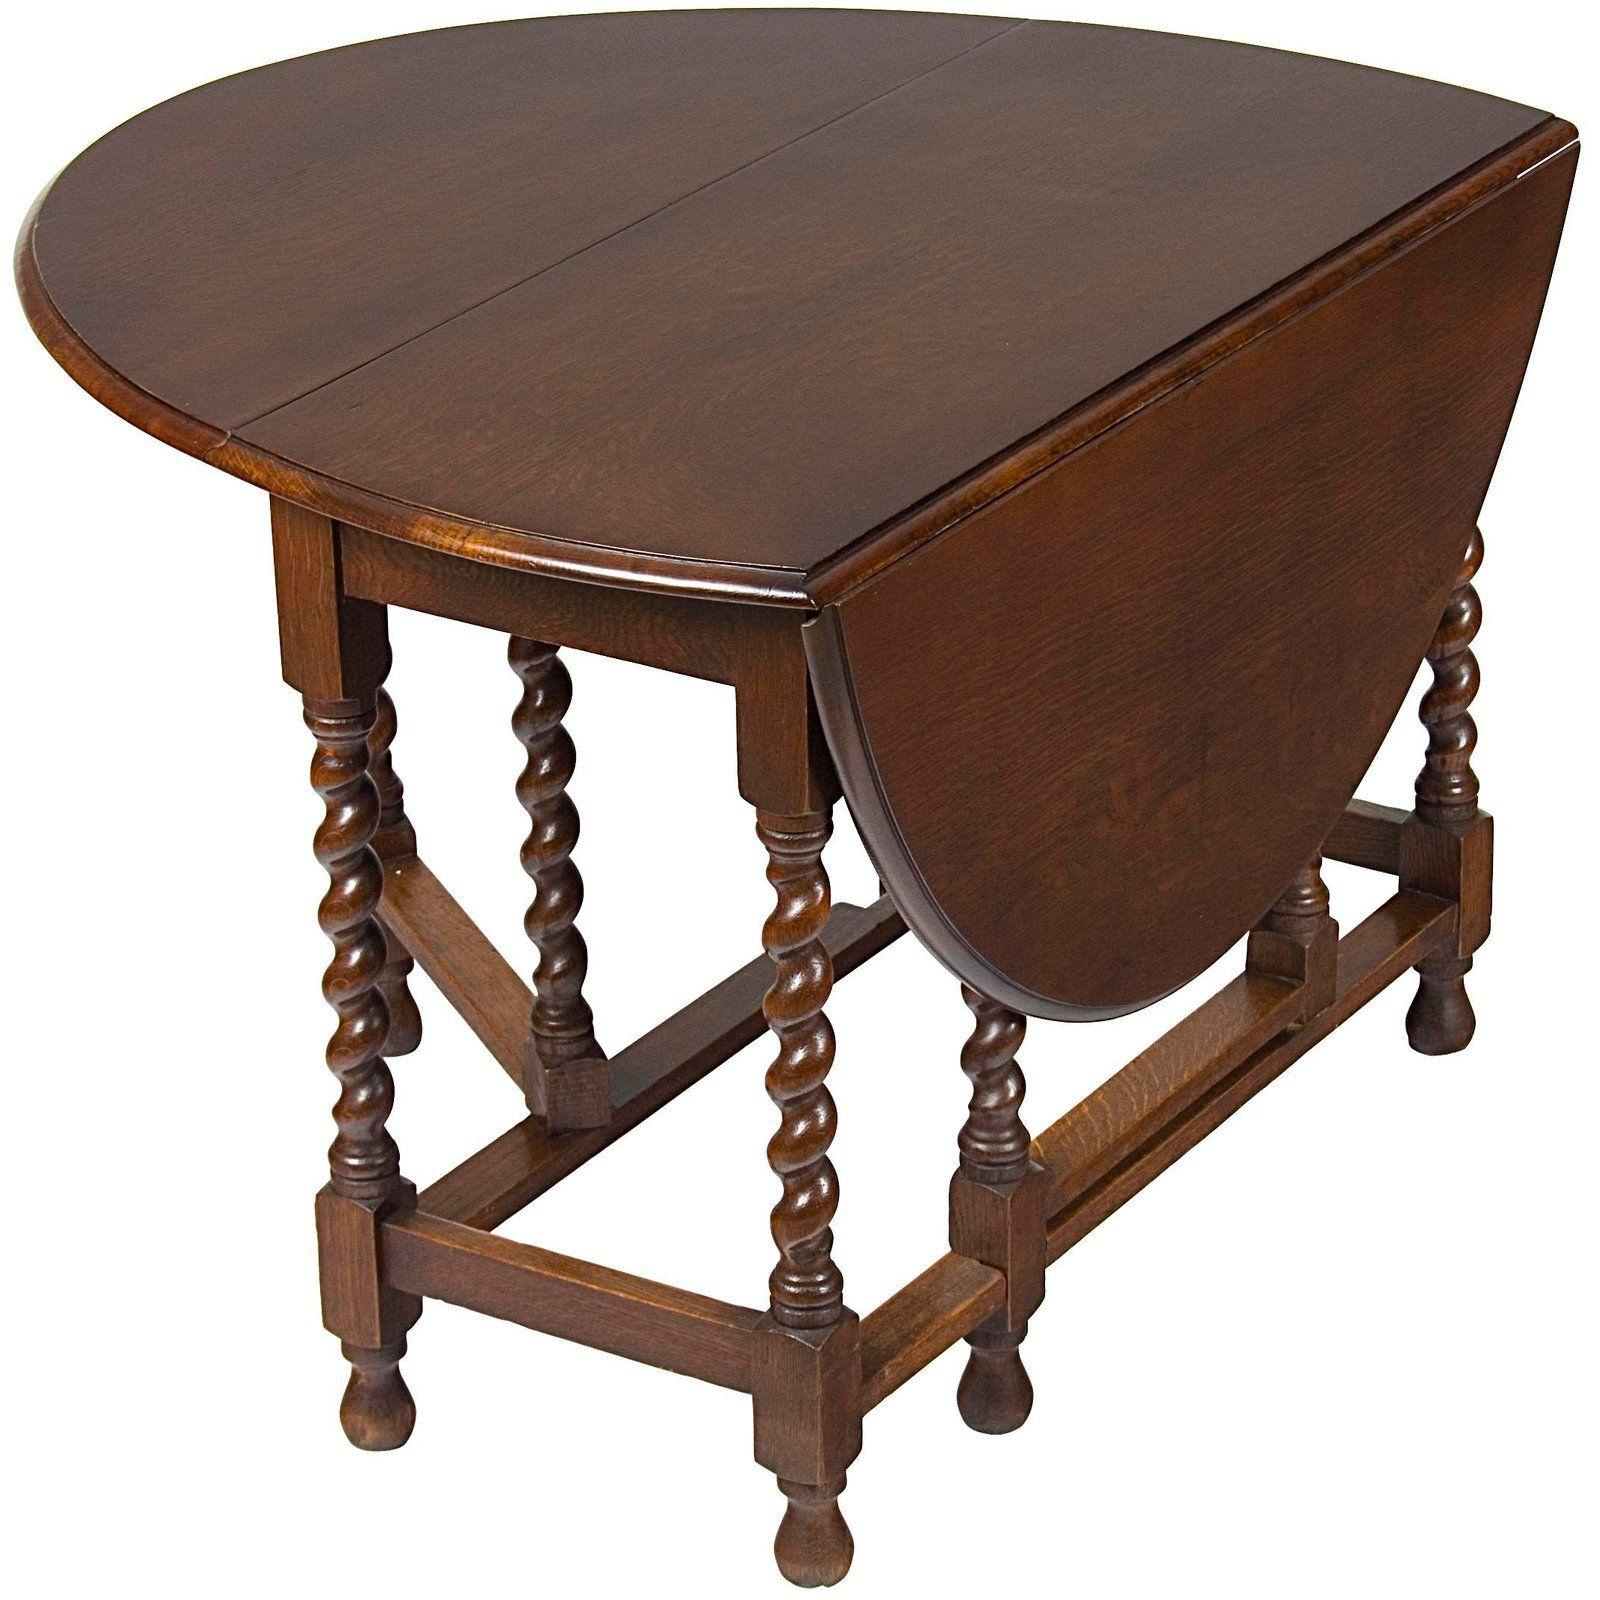 1920s Jacobean English Oak Barley Twist Gate Leg Drop Leaf Table